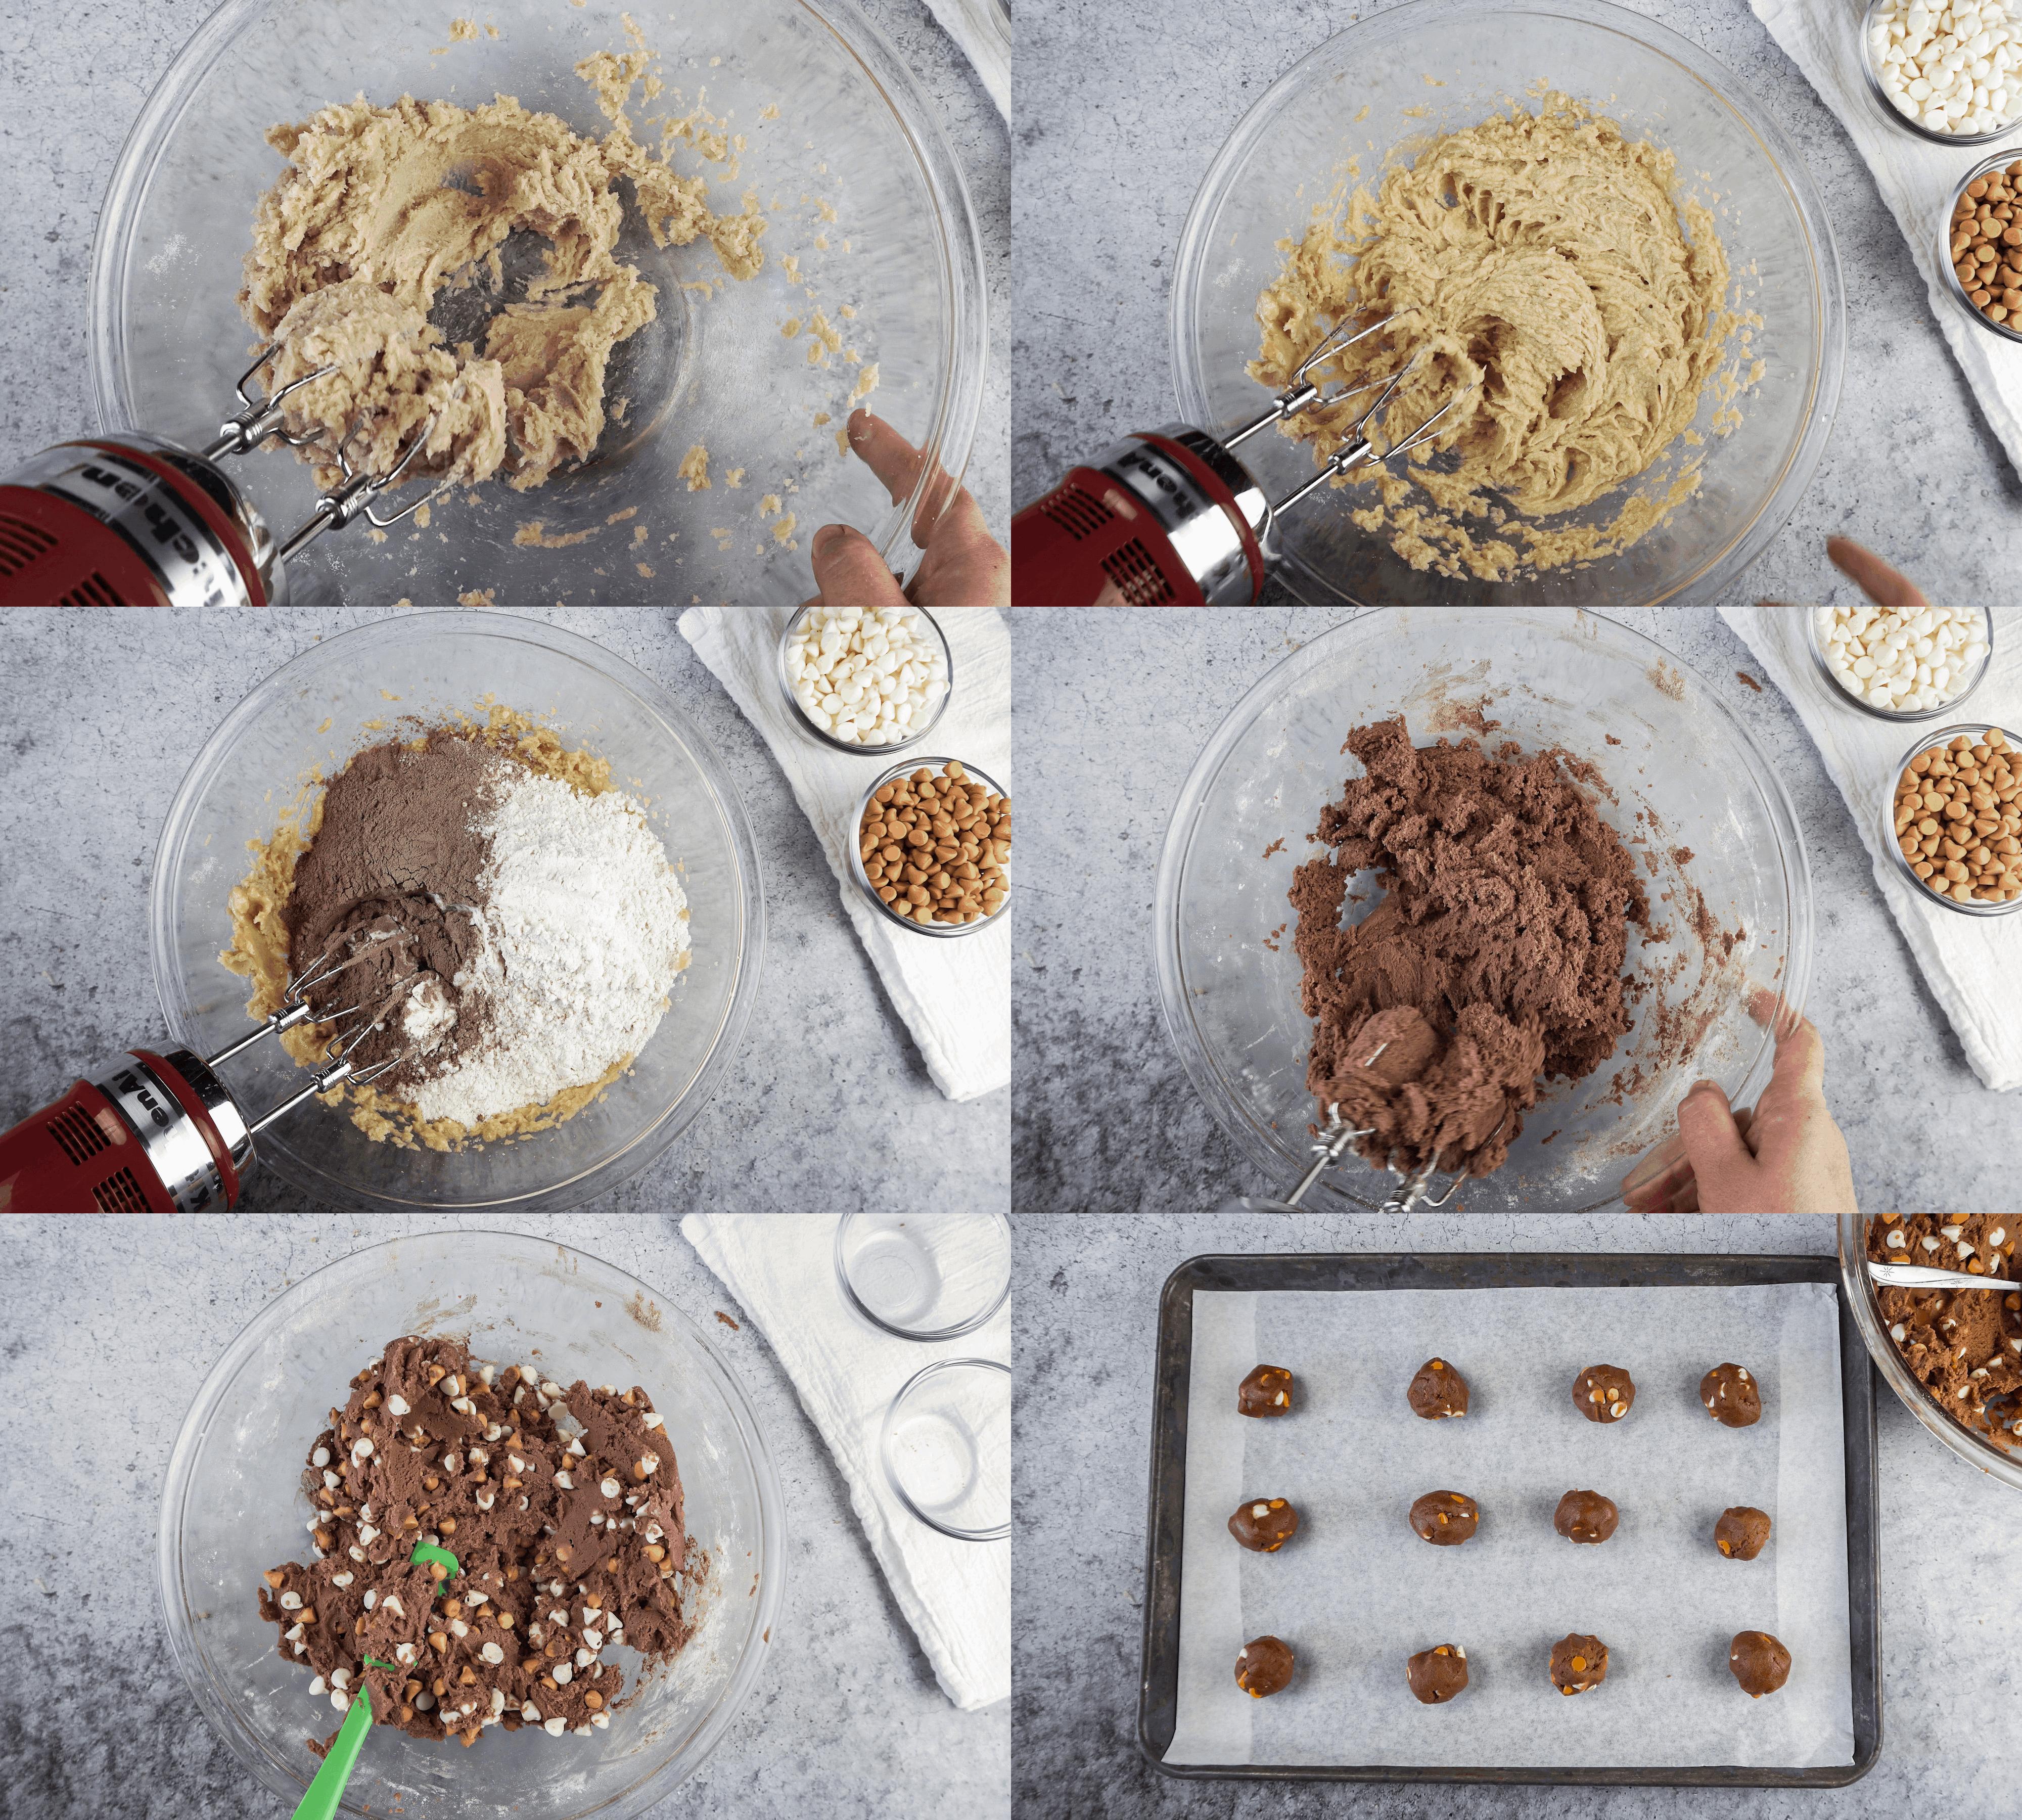 Steps showing batter, adding flour, and final dough